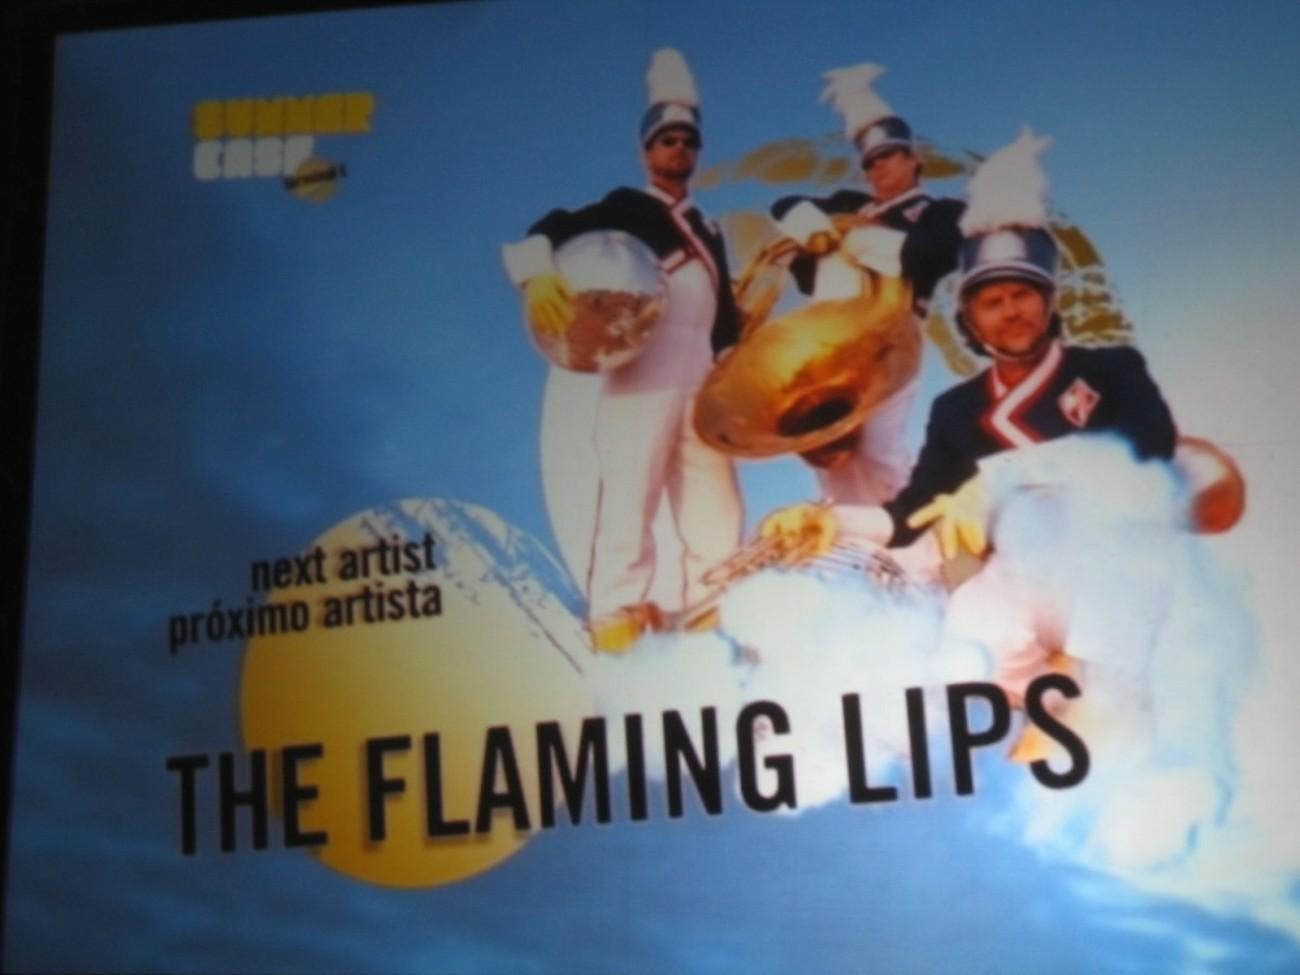 Begegnung in Barcelona: Wayne Coyne und die Flaming Lips